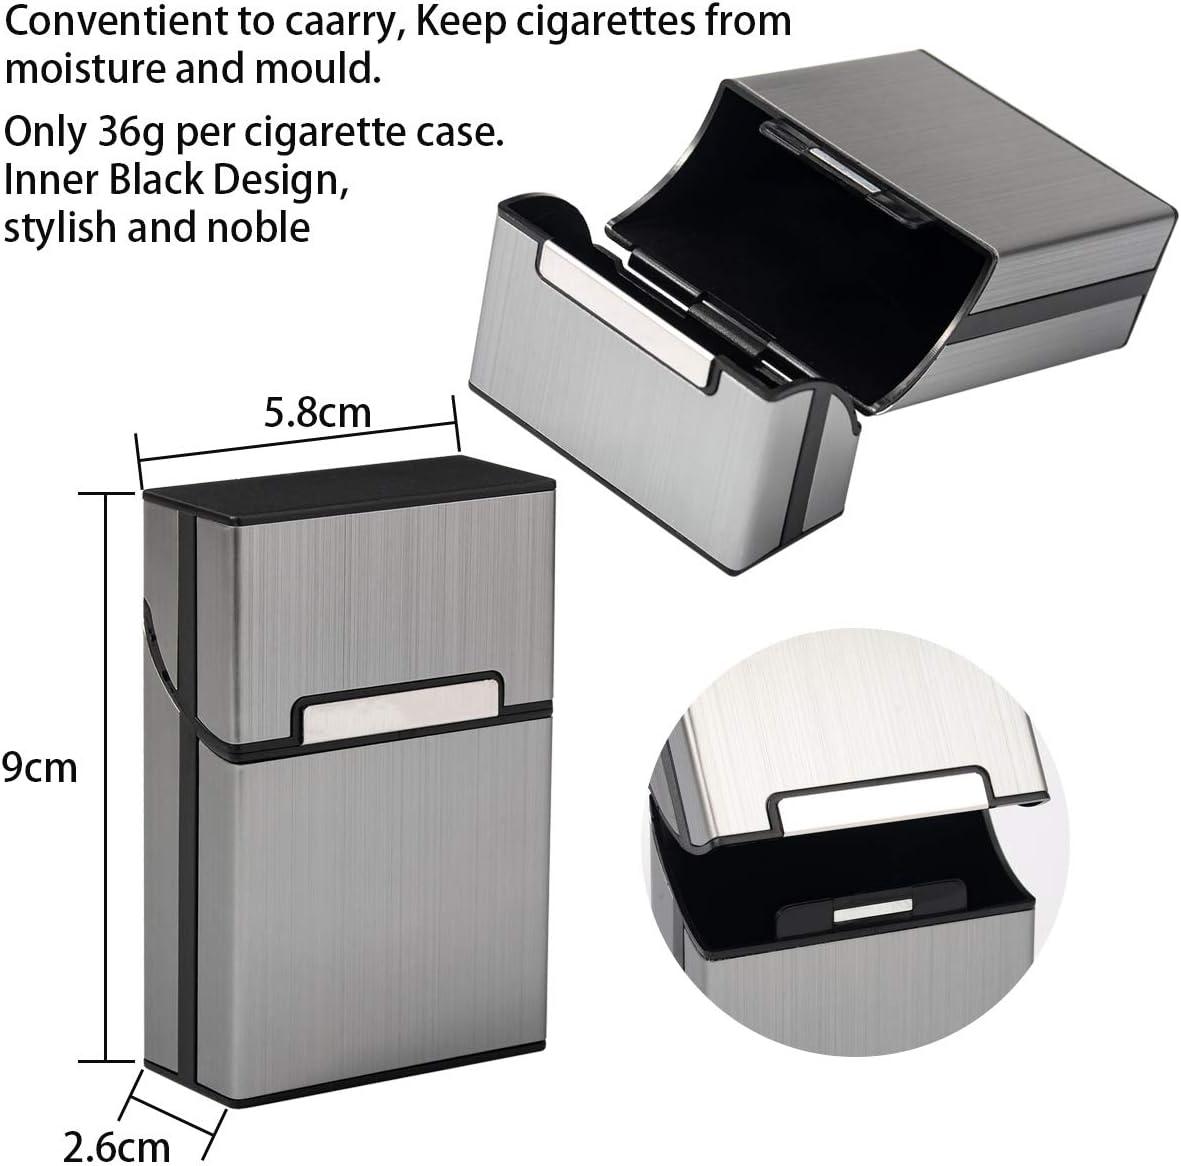 Automatische Regular Gr/ö/ße Zigarettenetui Edelstahl f/ür bis zu 20/Zigarette Zigarettenetui Uni Design